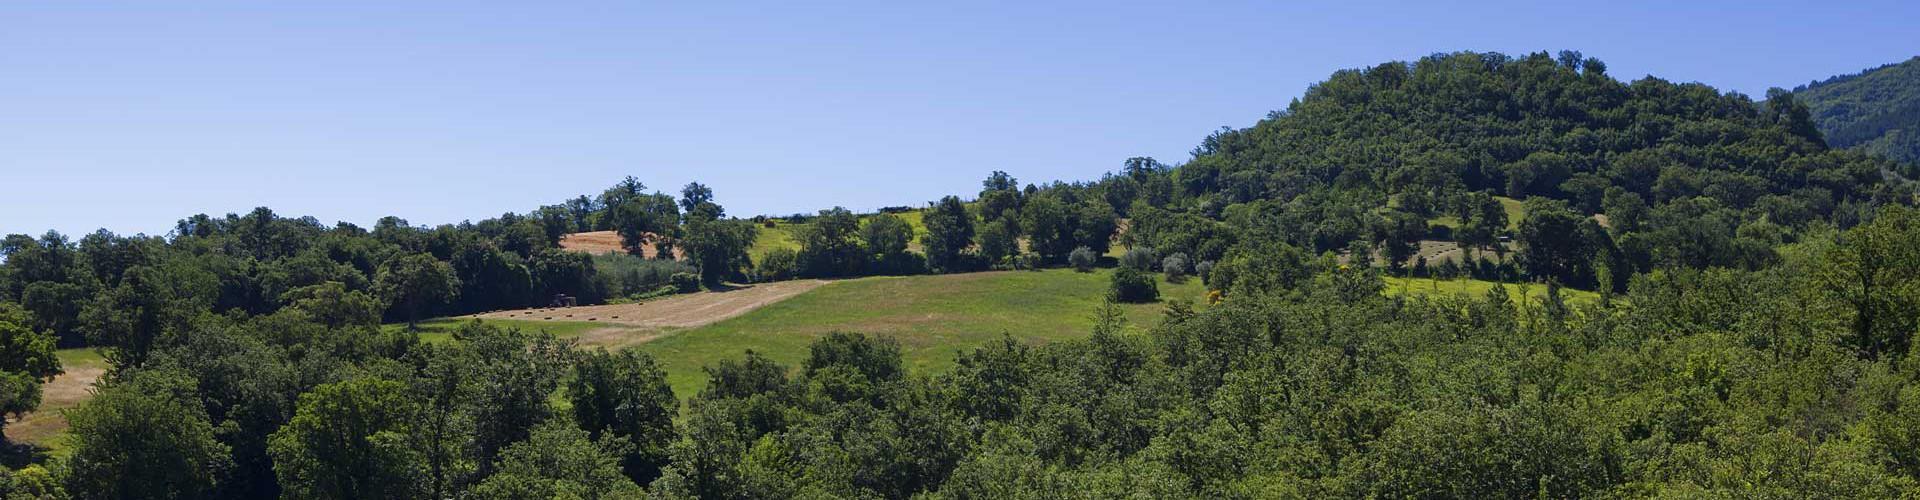 Relais Parco del Subasio | Agriturismo Assisi - Gallery Featured Image